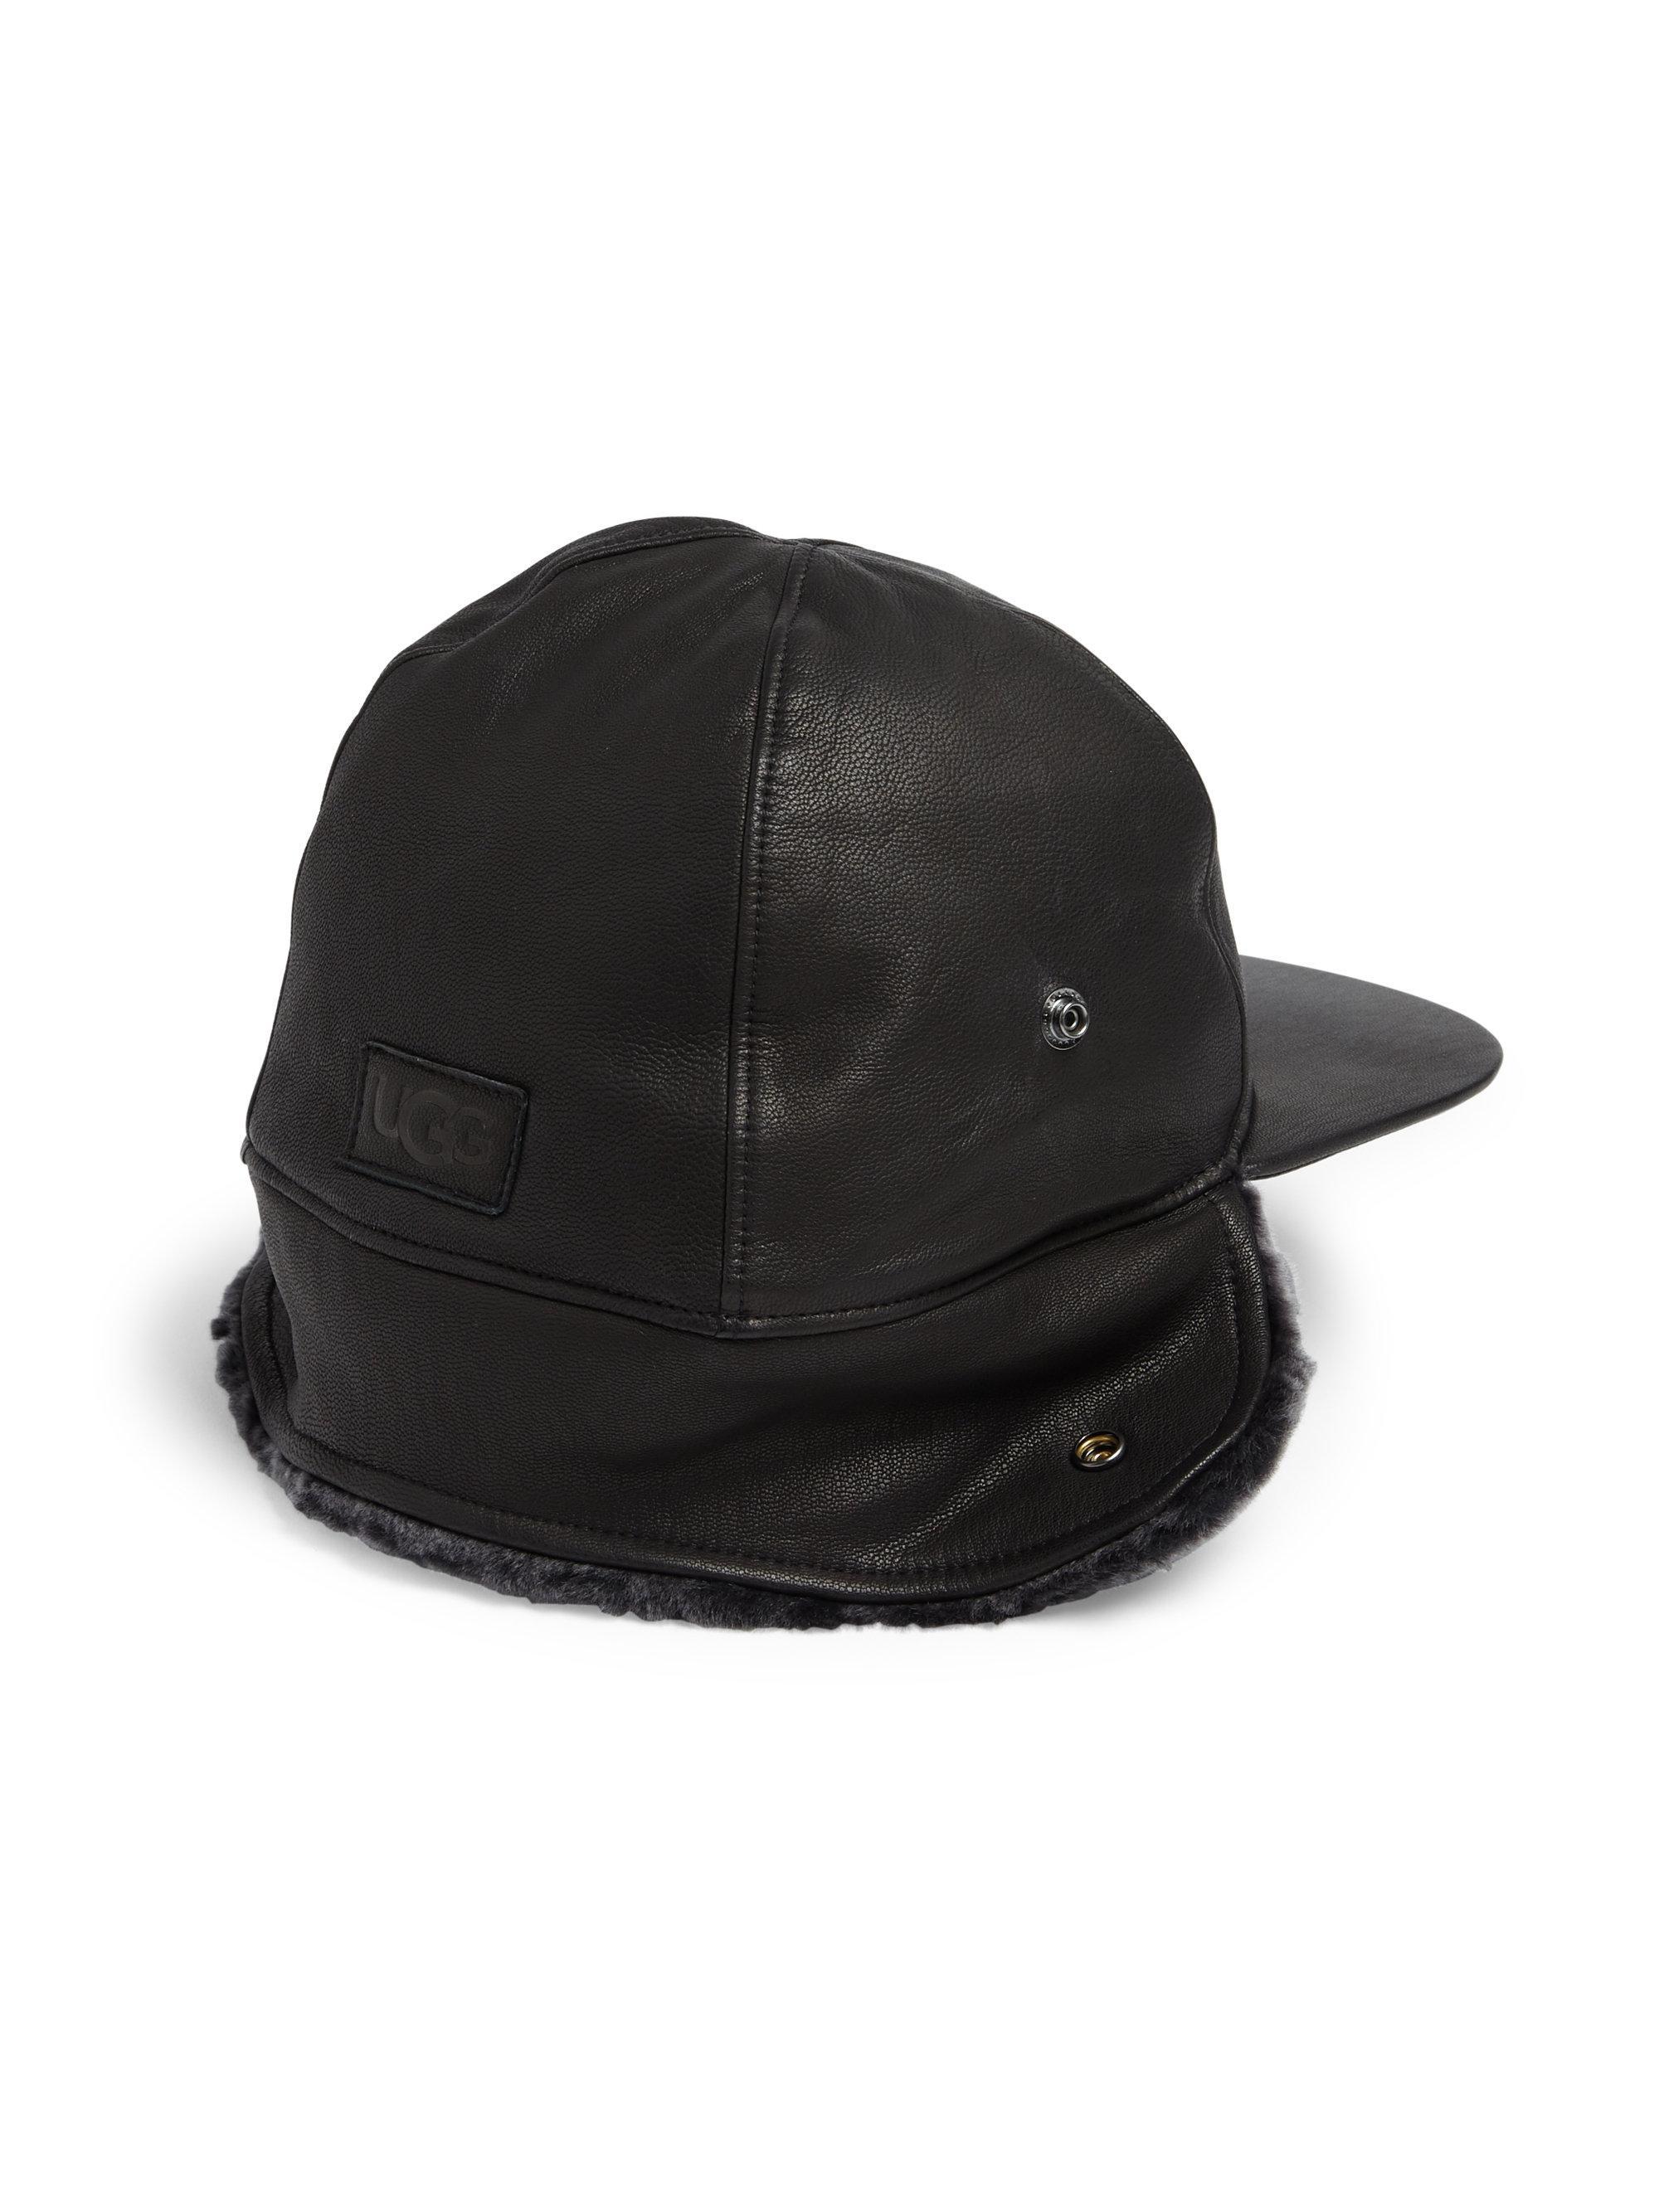 Ugg - Black Sheepskin Shearling Fur Trimmed Leather Baseball Hat for Men -  Lyst. View fullscreen c05690323b20